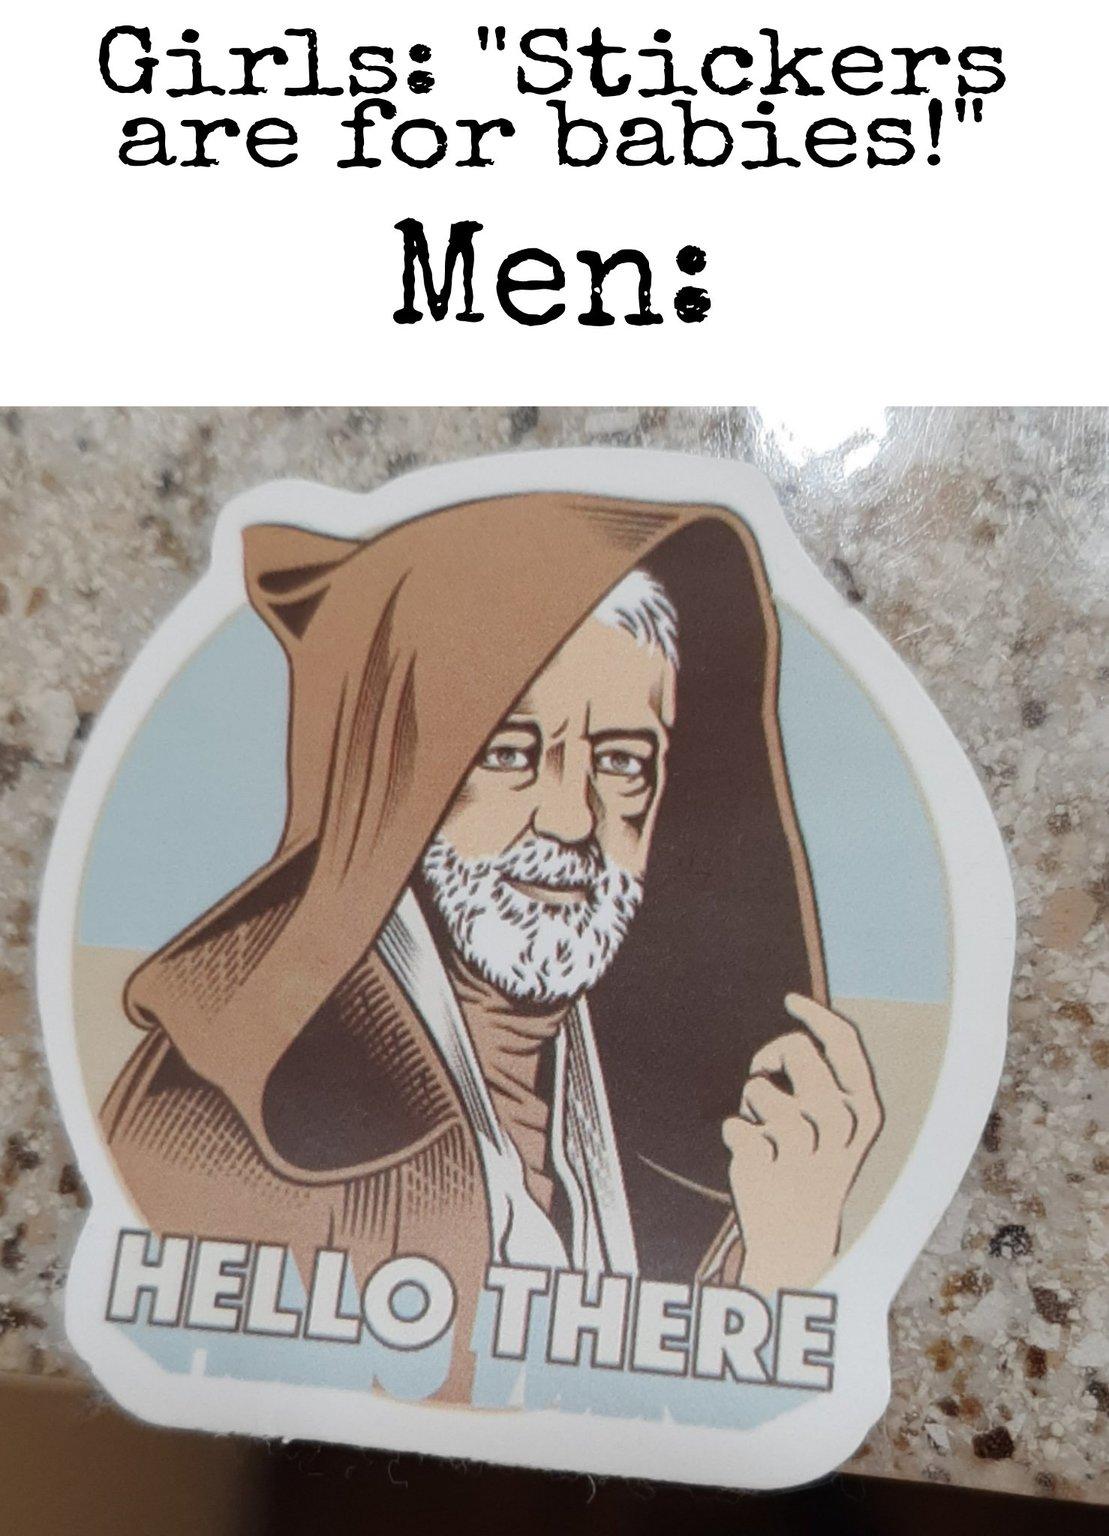 Fresh OC (⌐■ ͜ ■) got this sticker from my cousin - meme